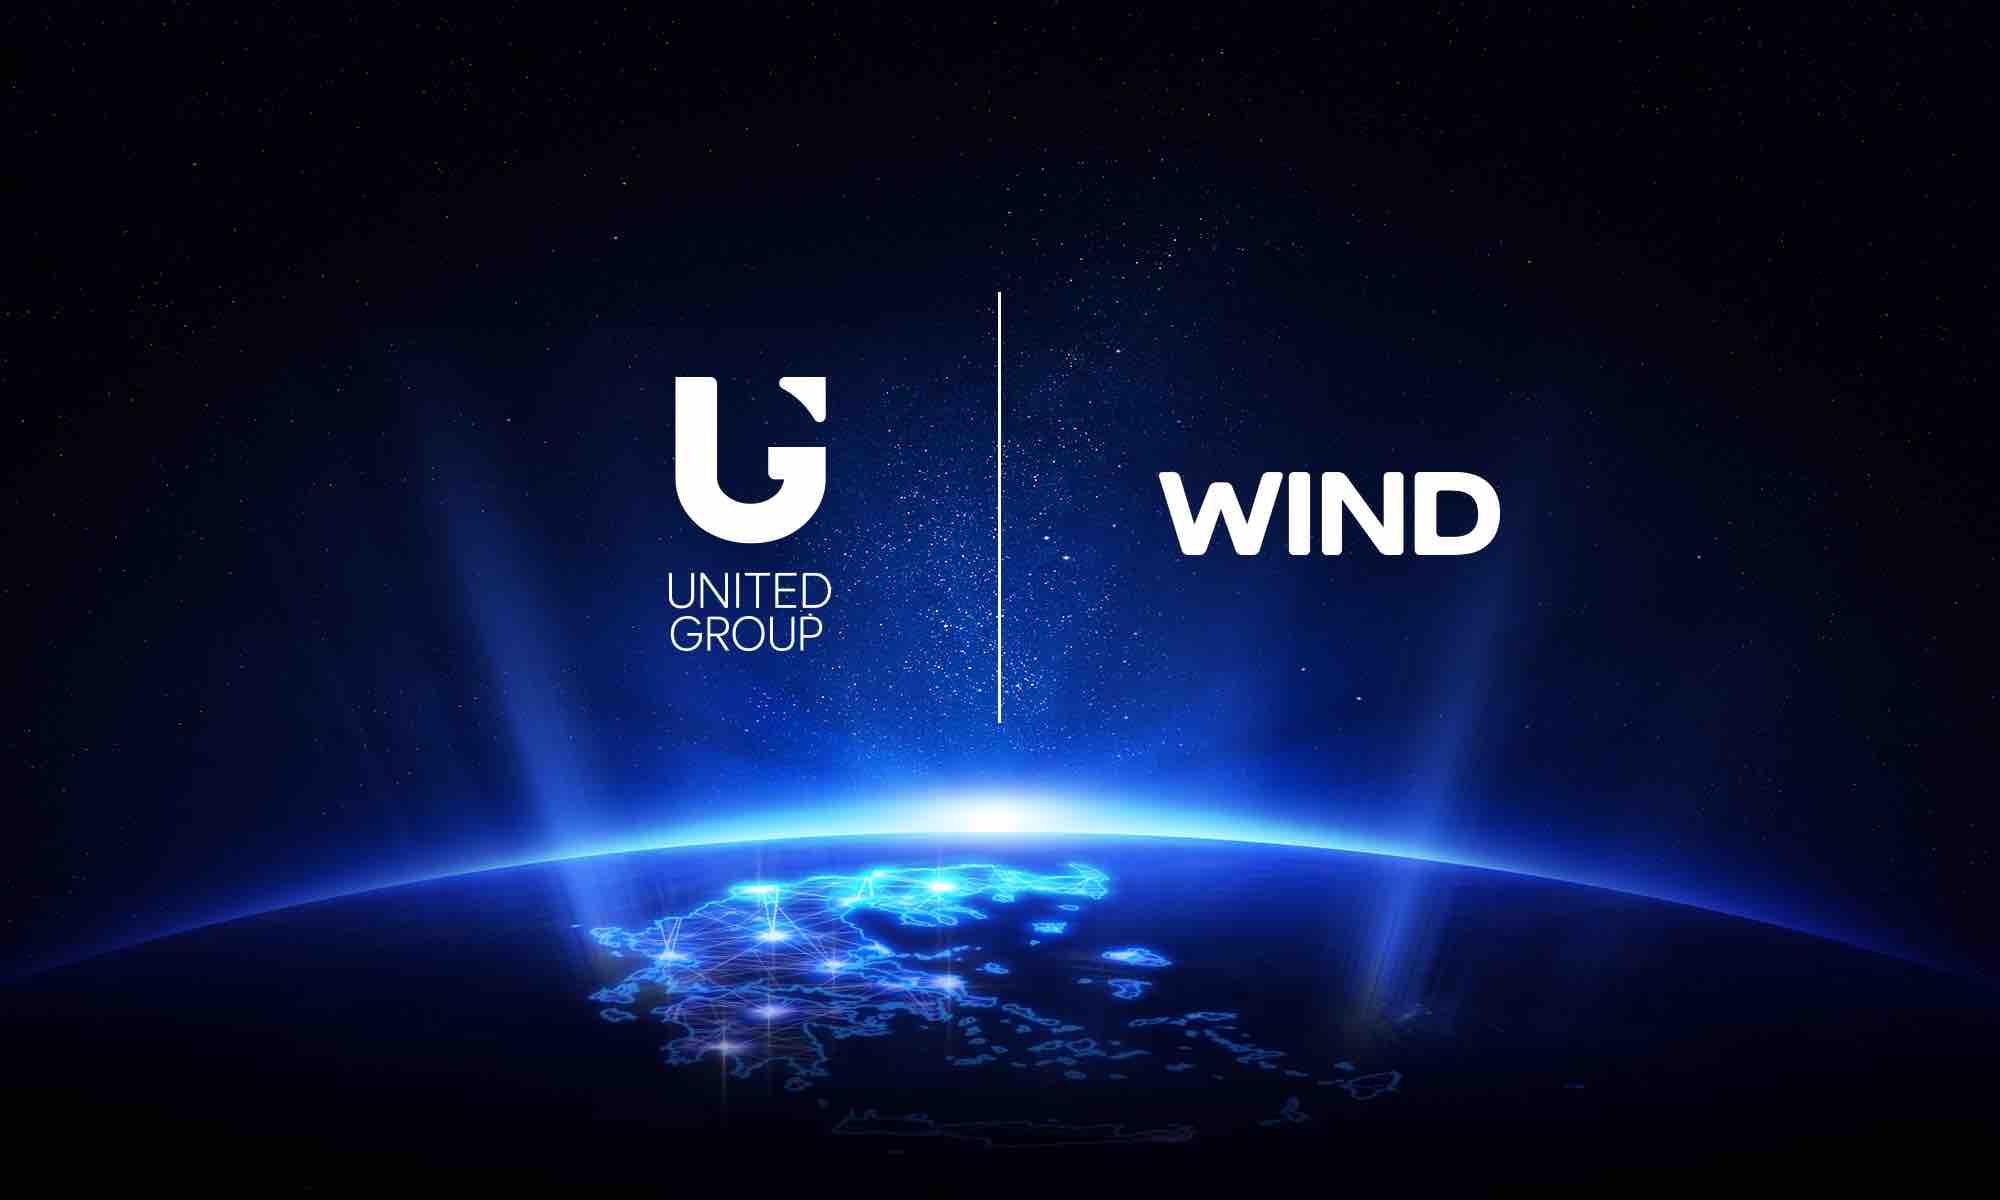 UG Wind